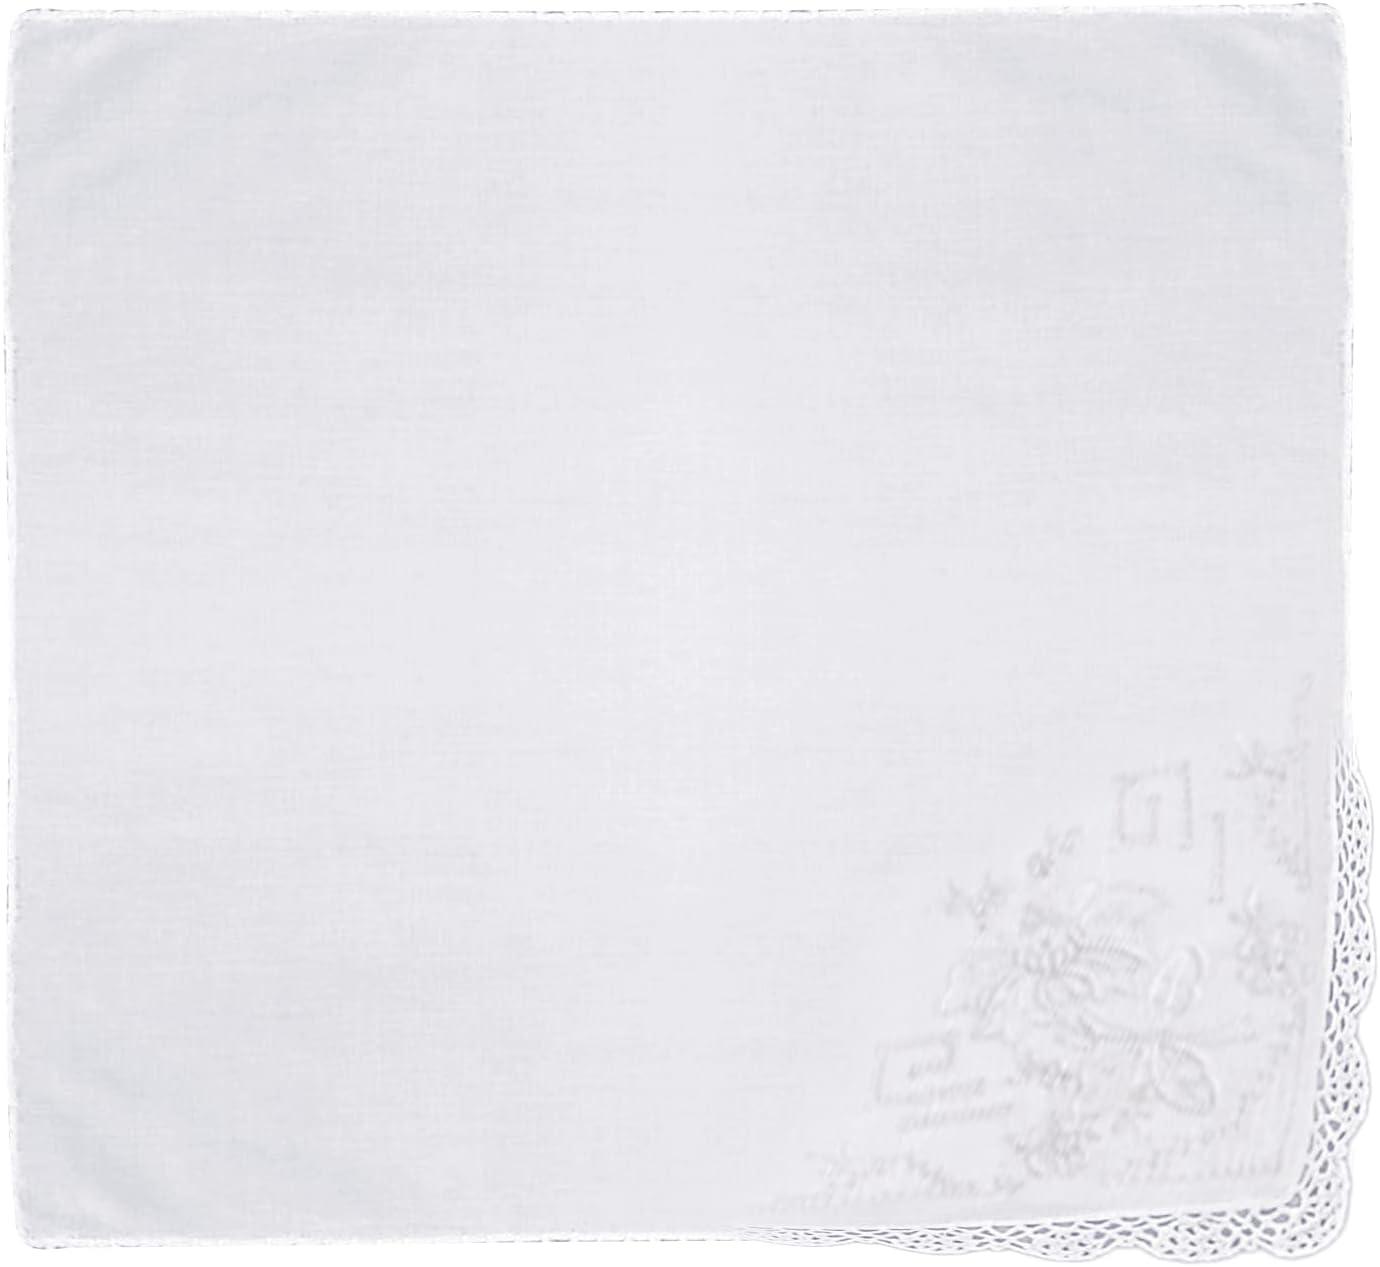 Handmade Embroidered Handkerchief - 12